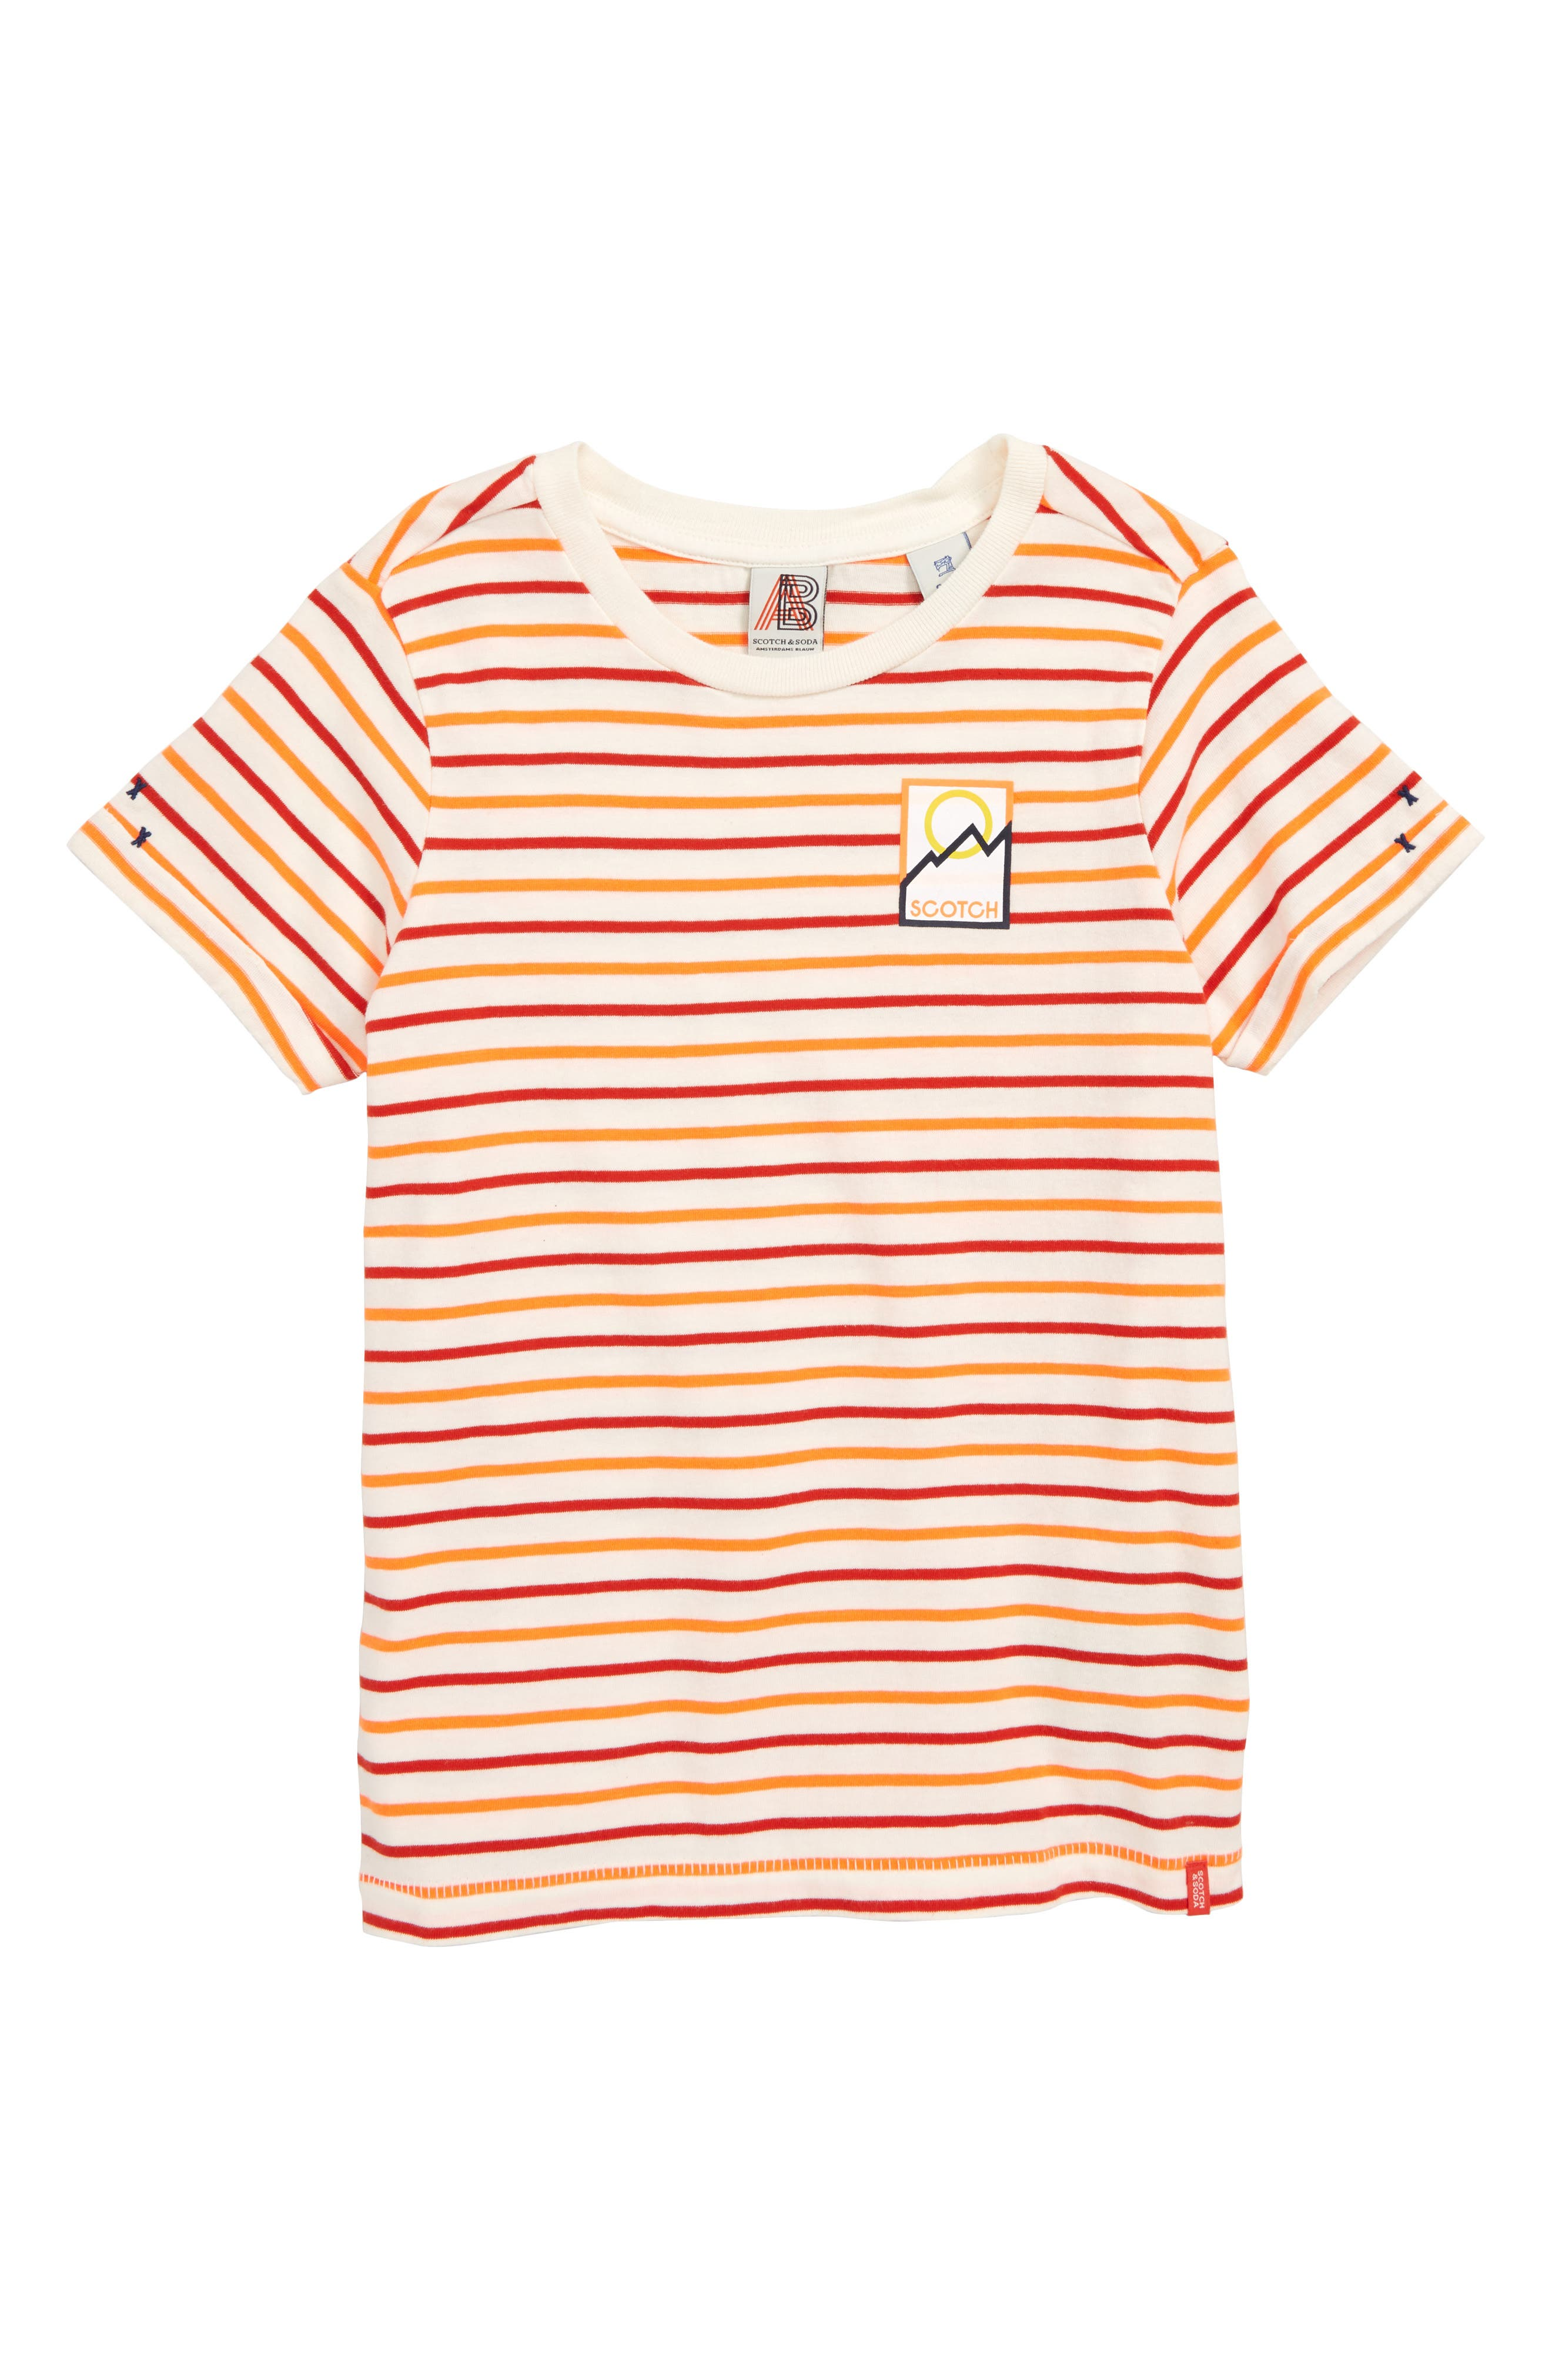 Regular Fit T-Shirt, Main, color, ORANGE